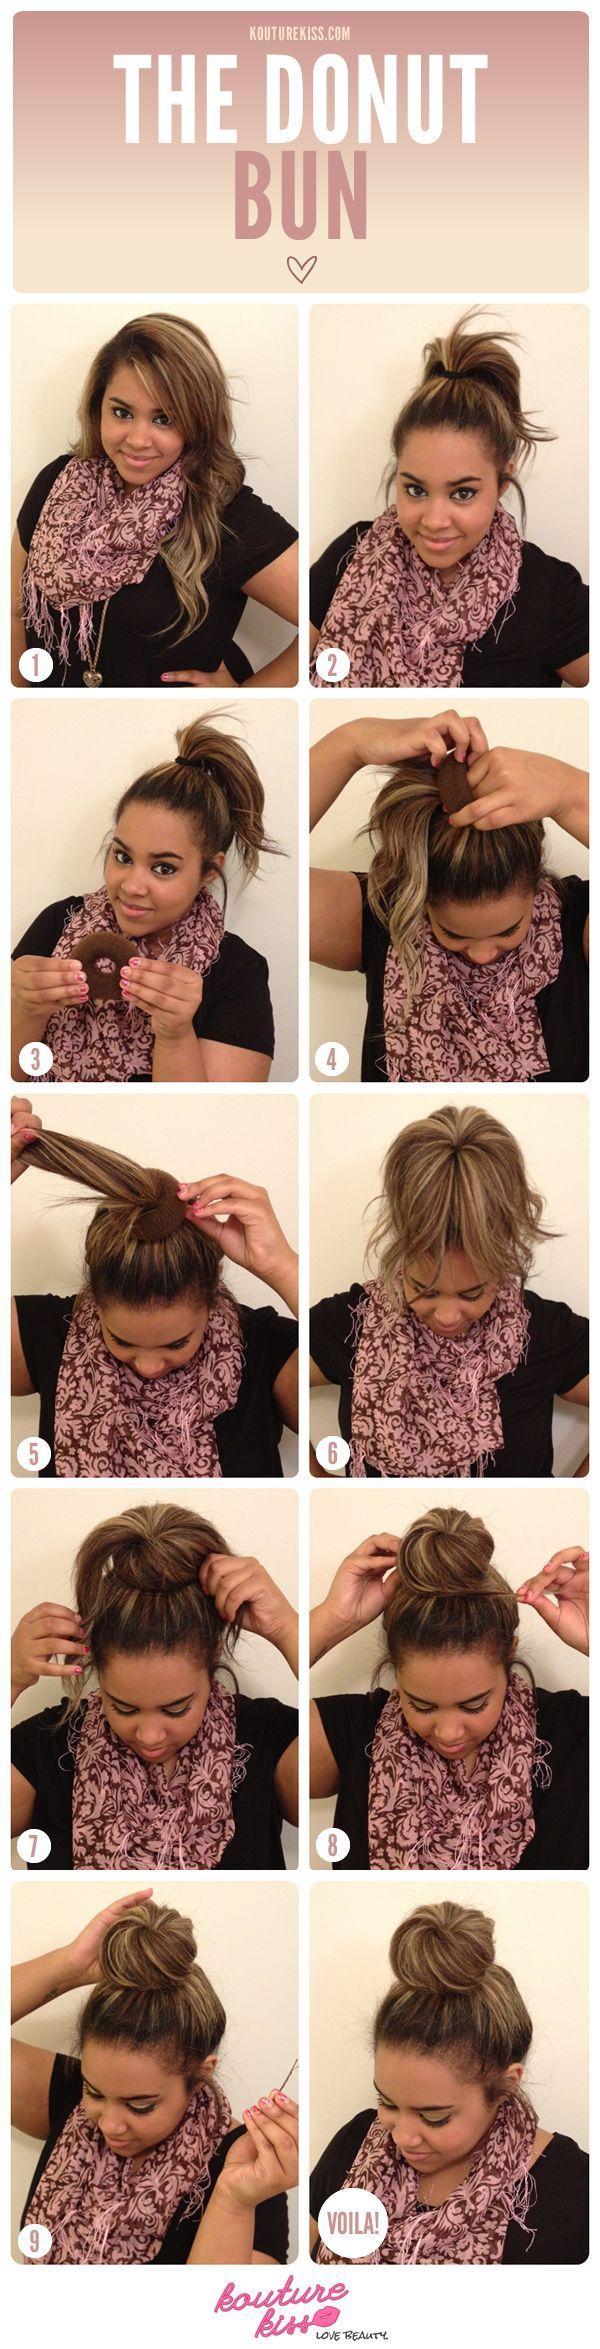 Miraculous 1000 Ideas About Donut Bun Hairstyles On Pinterest Donut Bun Short Hairstyles For Black Women Fulllsitofus